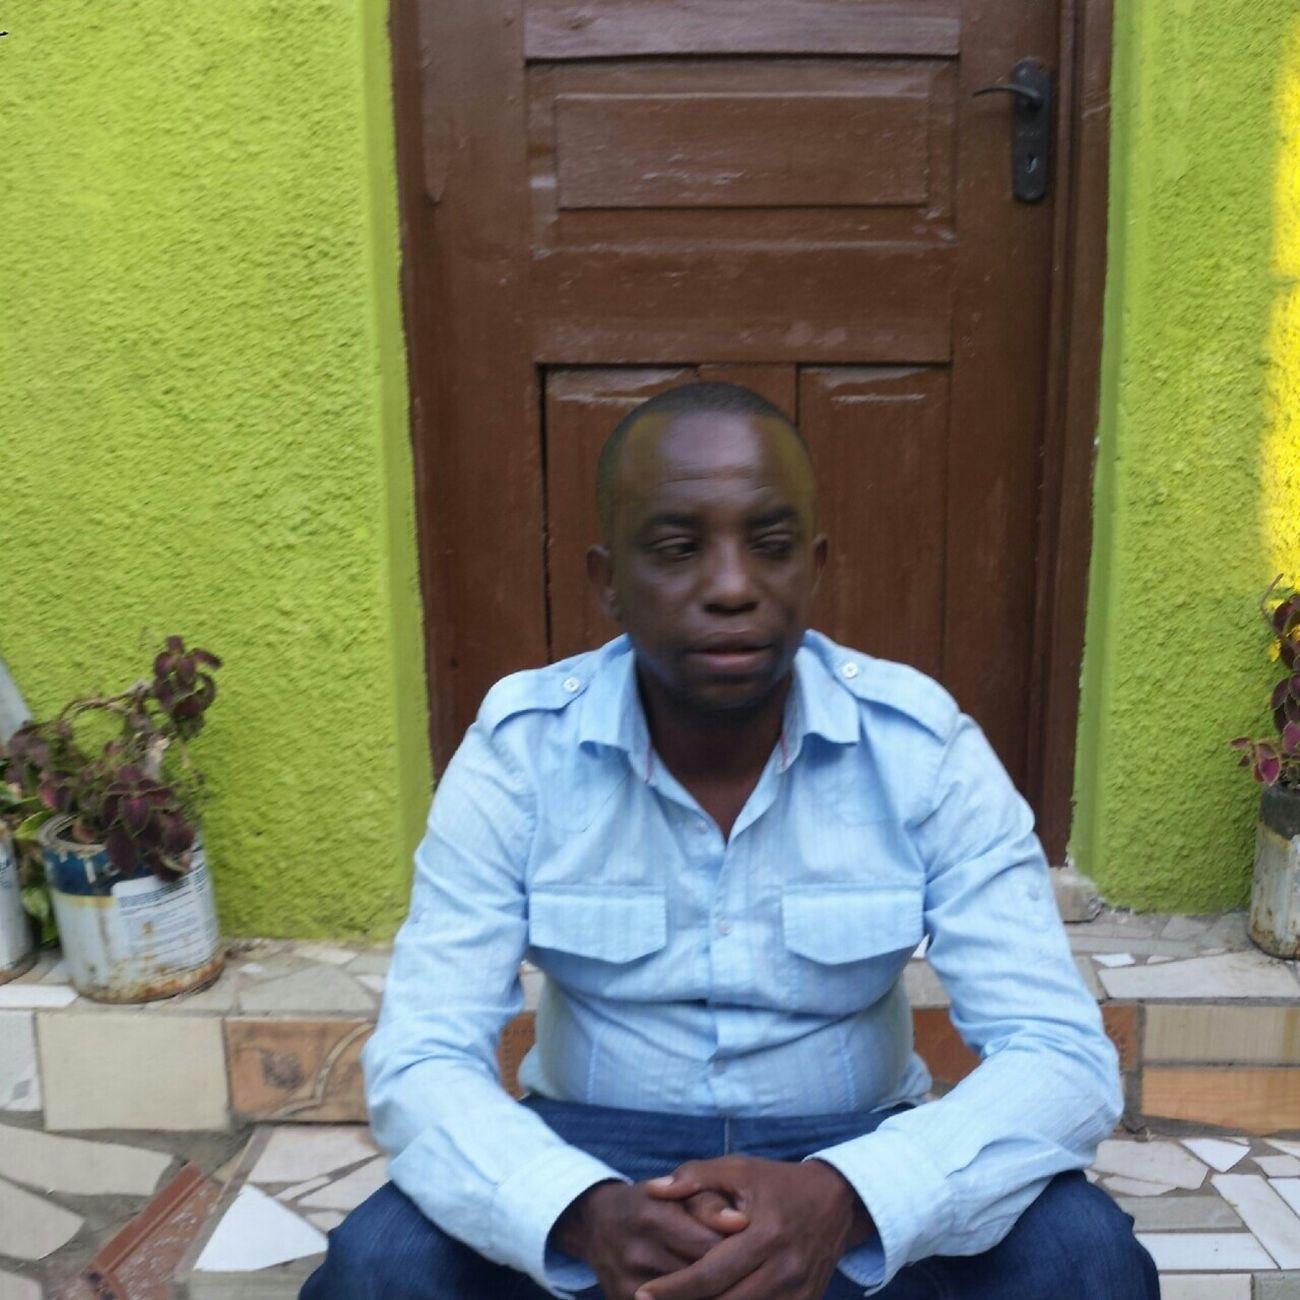 karibuni holday inn pub Home Sweet Home